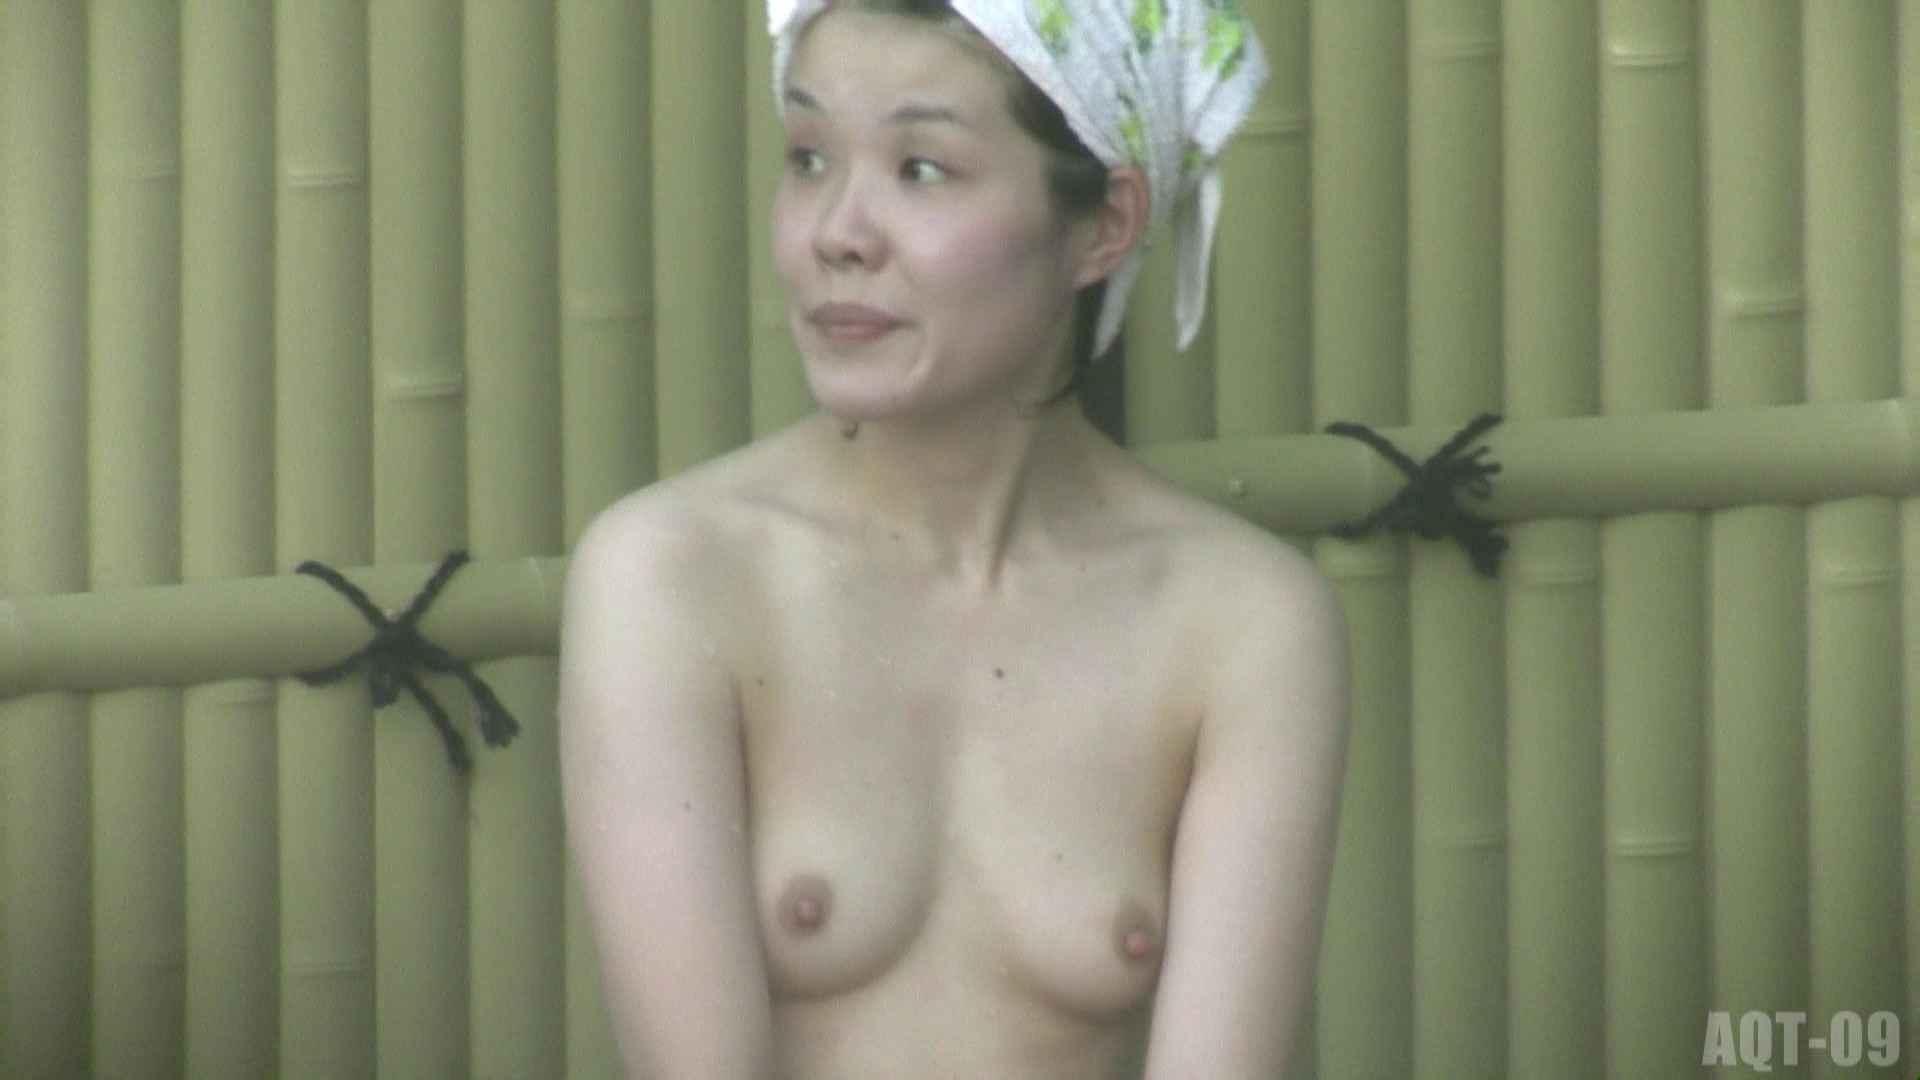 Aquaな露天風呂Vol.786 OLセックス | 盗撮  74画像 10